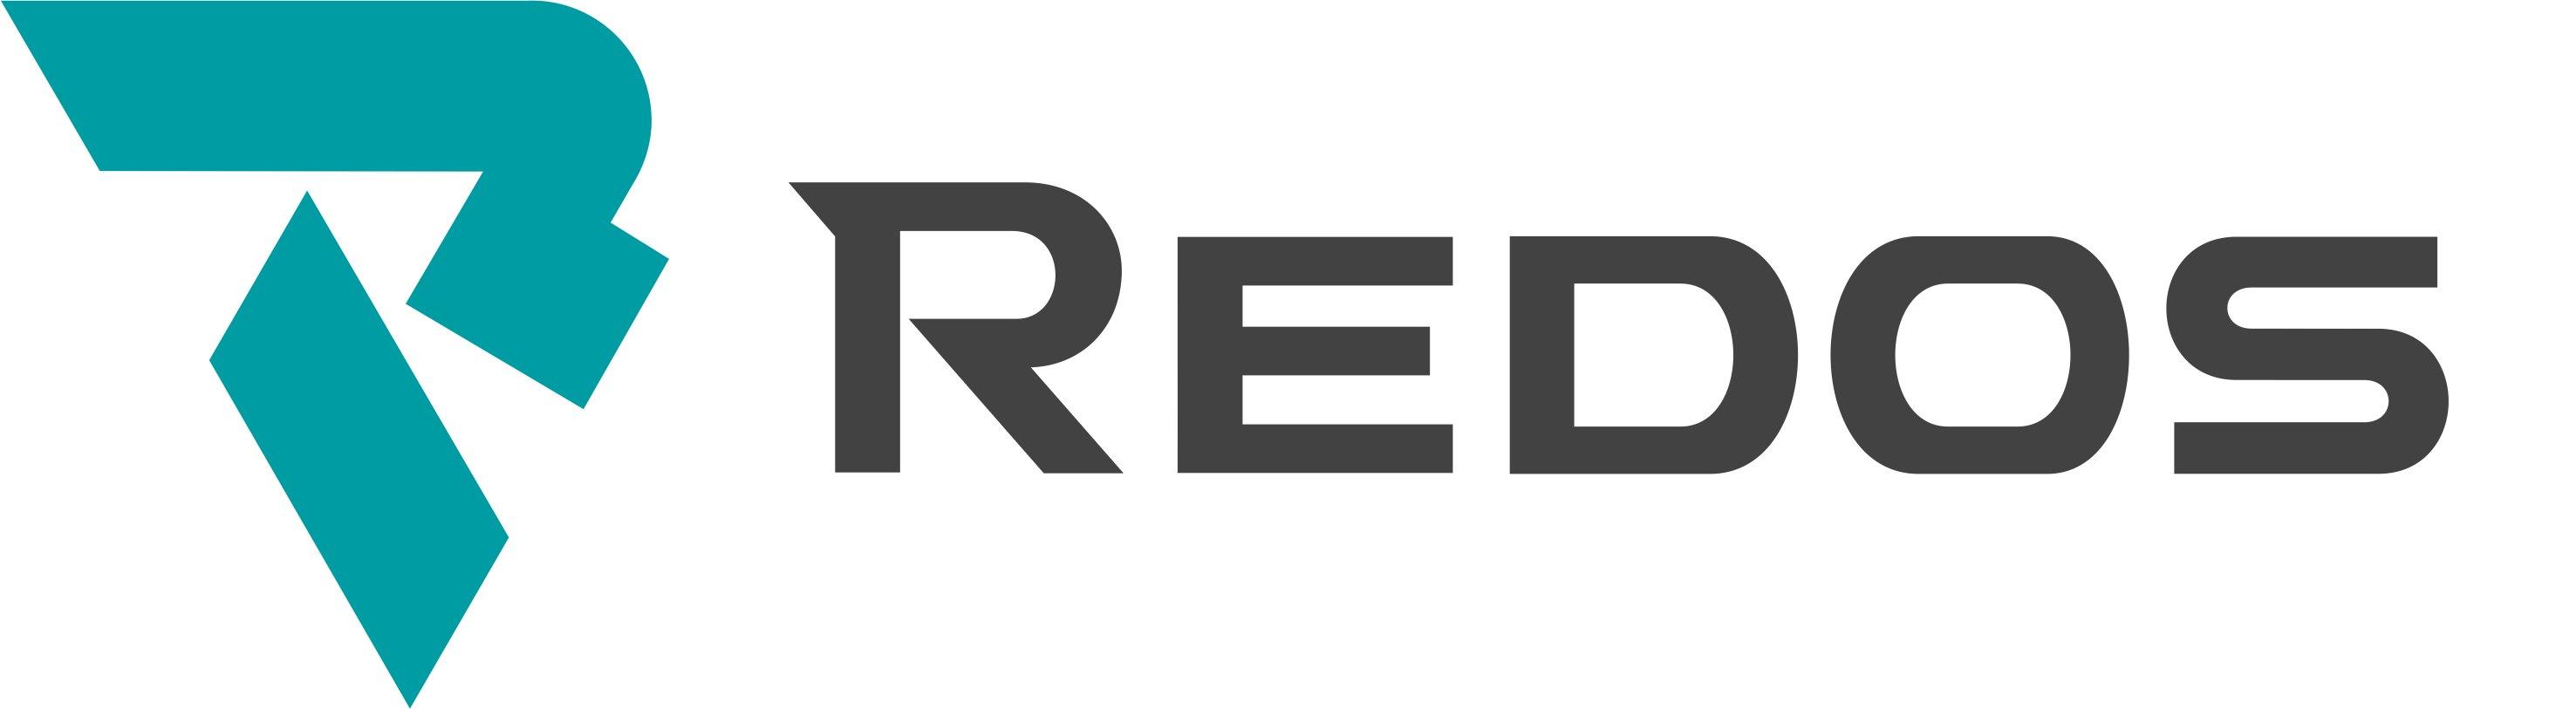 Redos Trailers Sp. z o.o.